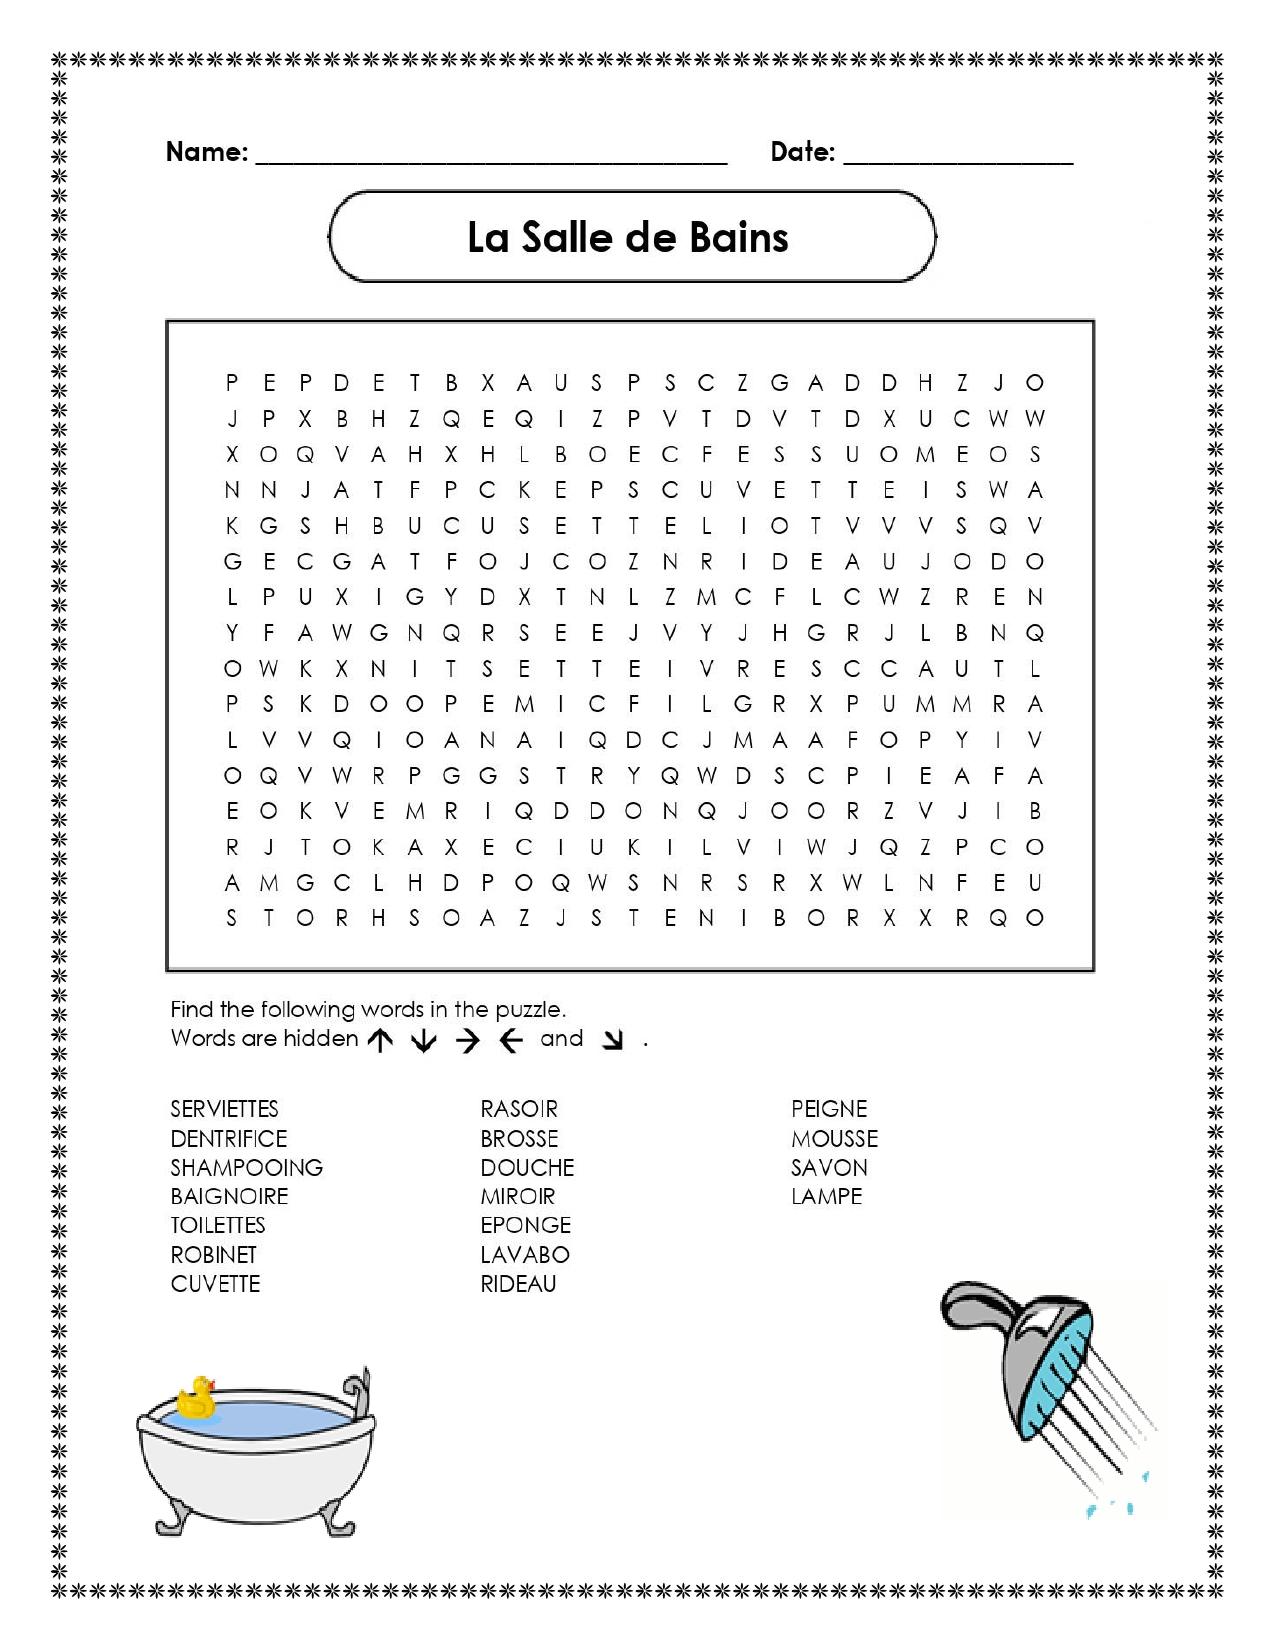 La Salle De Bains French Bathroom Distance Learning